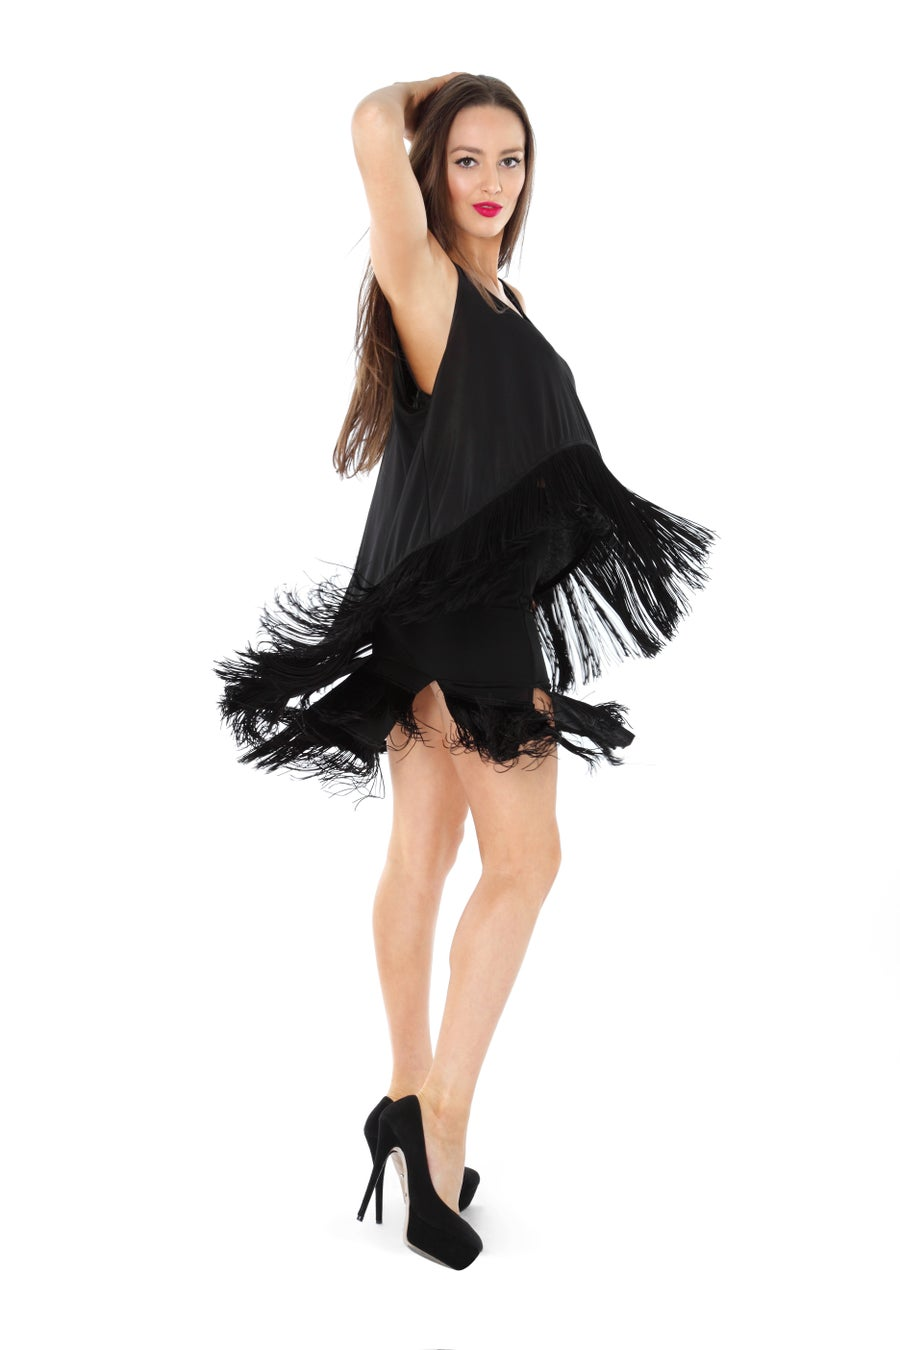 Image of Panelled Flapper Skirt J8689 Dancewear latin ballroom